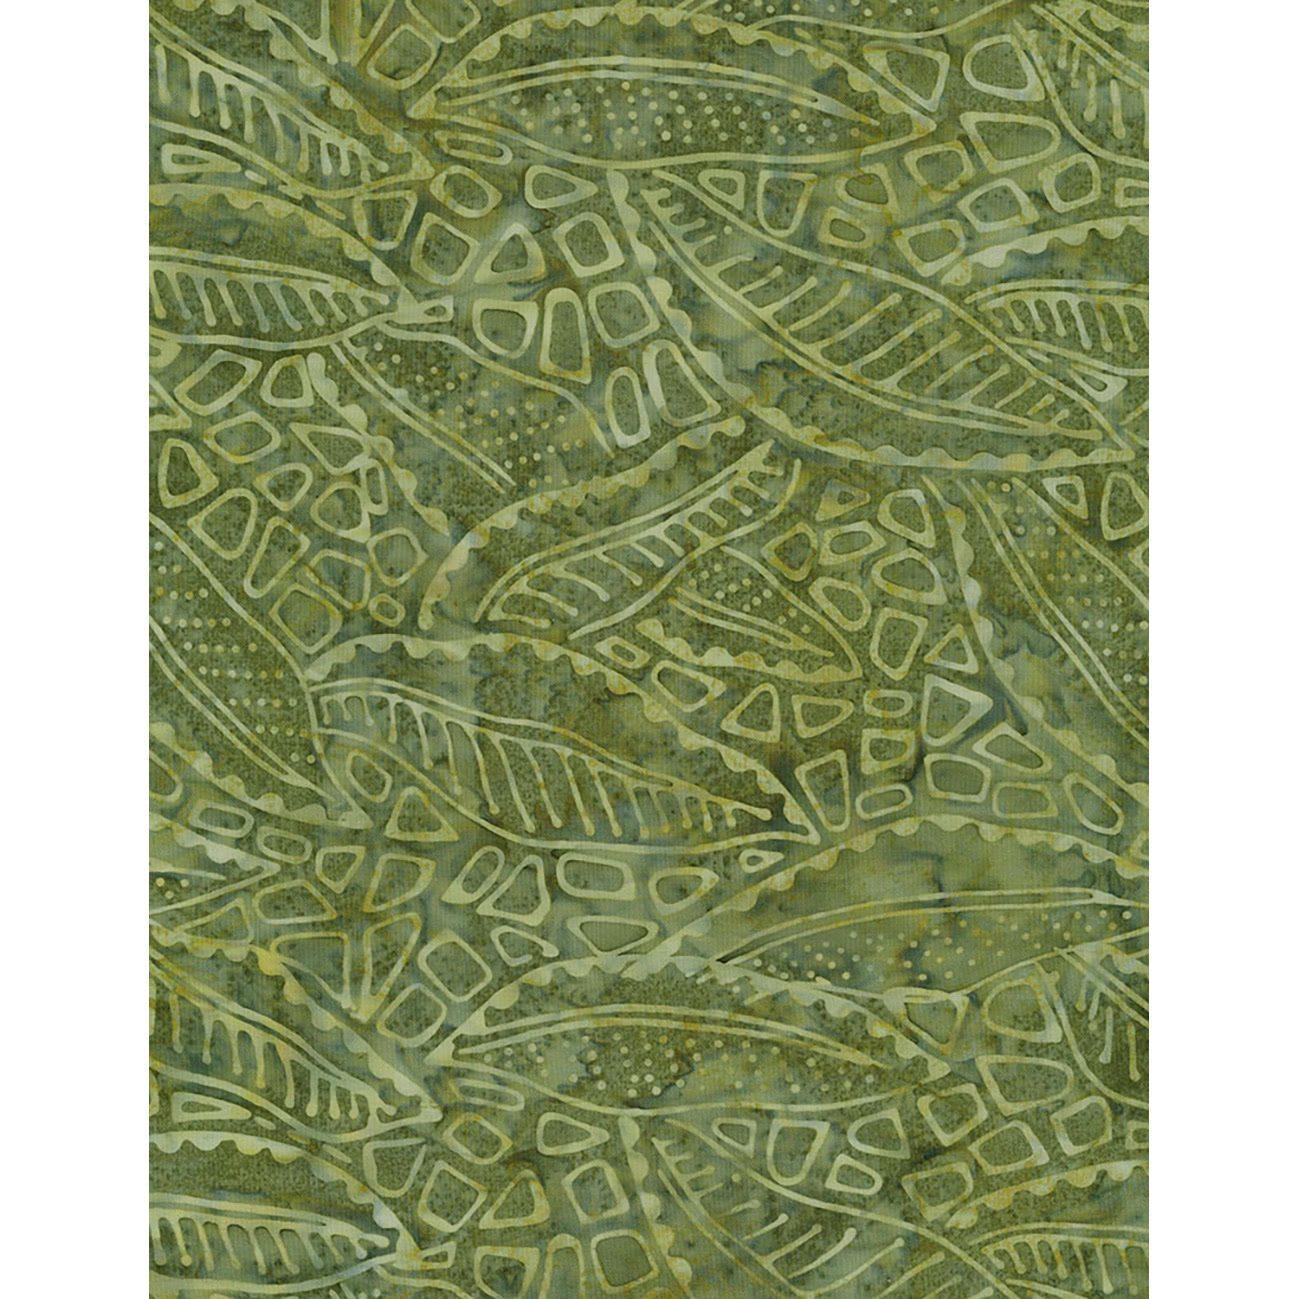 1.875 yards; Timeless Treasures; Tonga Lush; Wing and a Prayer; Lush BOTM Paisley Batik Fabric; B6203-Lush; Last piece